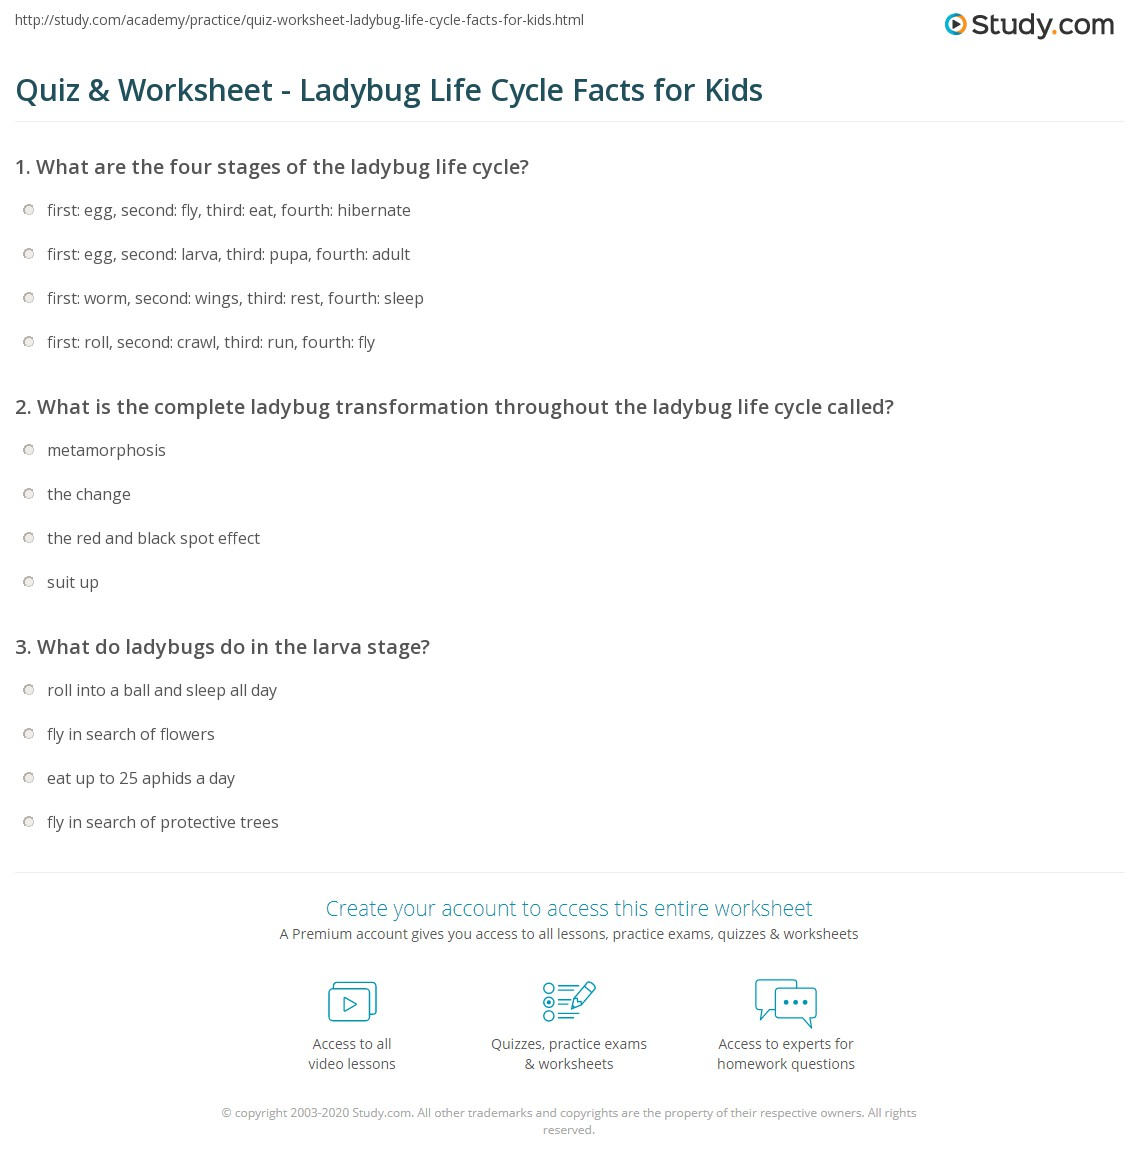 Quiz Worksheet Ladybug Life Cycle Facts for Kids – Ladybug Life Cycle Worksheet